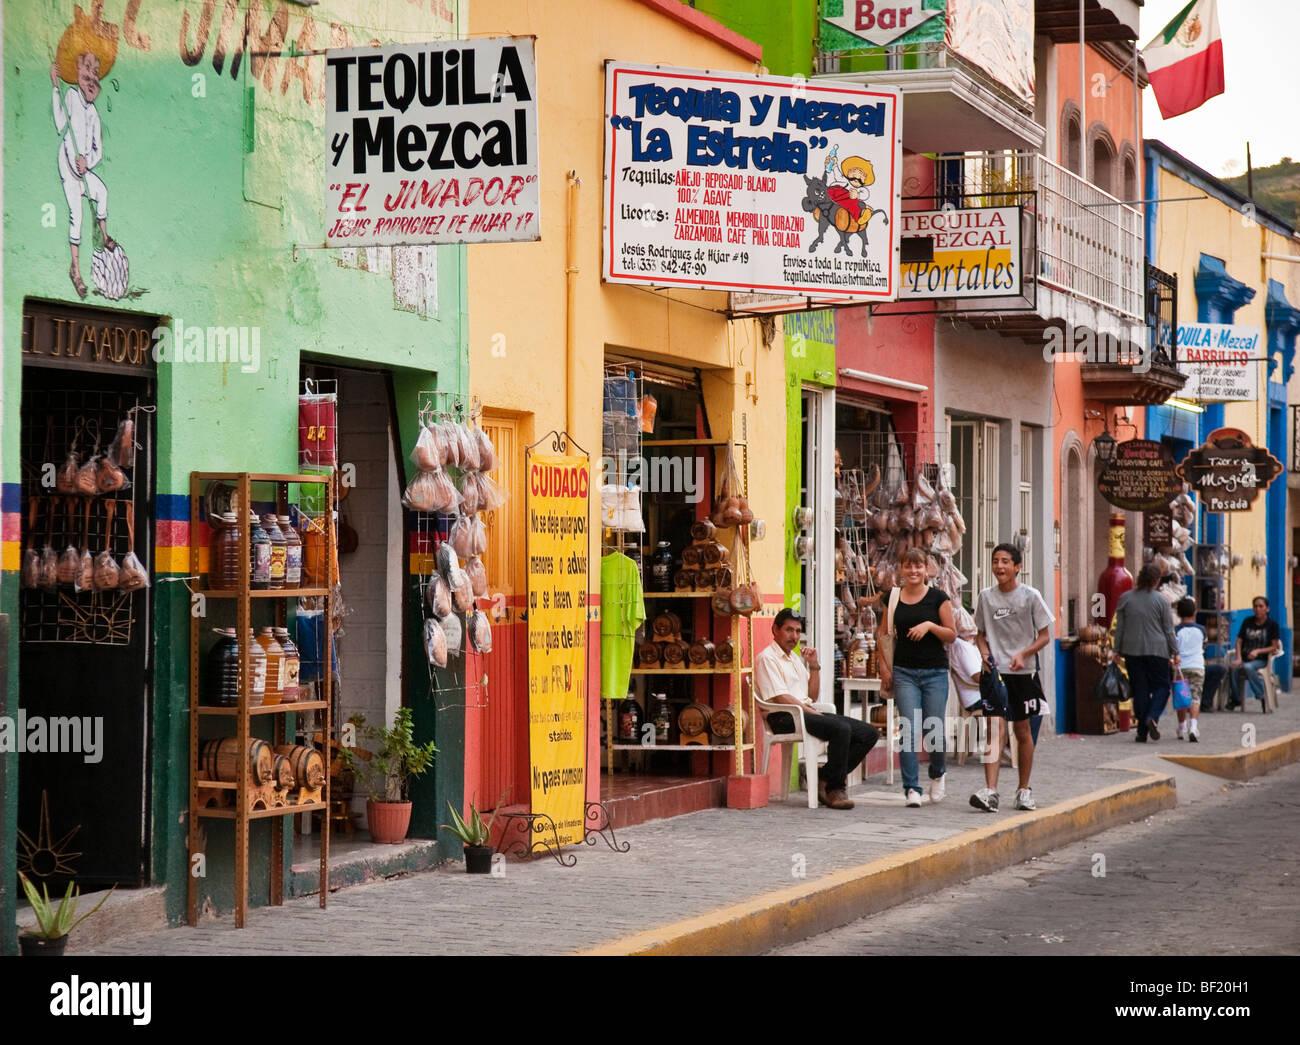 Tequila-Läden in der Stadt Tequila, Jalisco, Mexiko. Stockbild